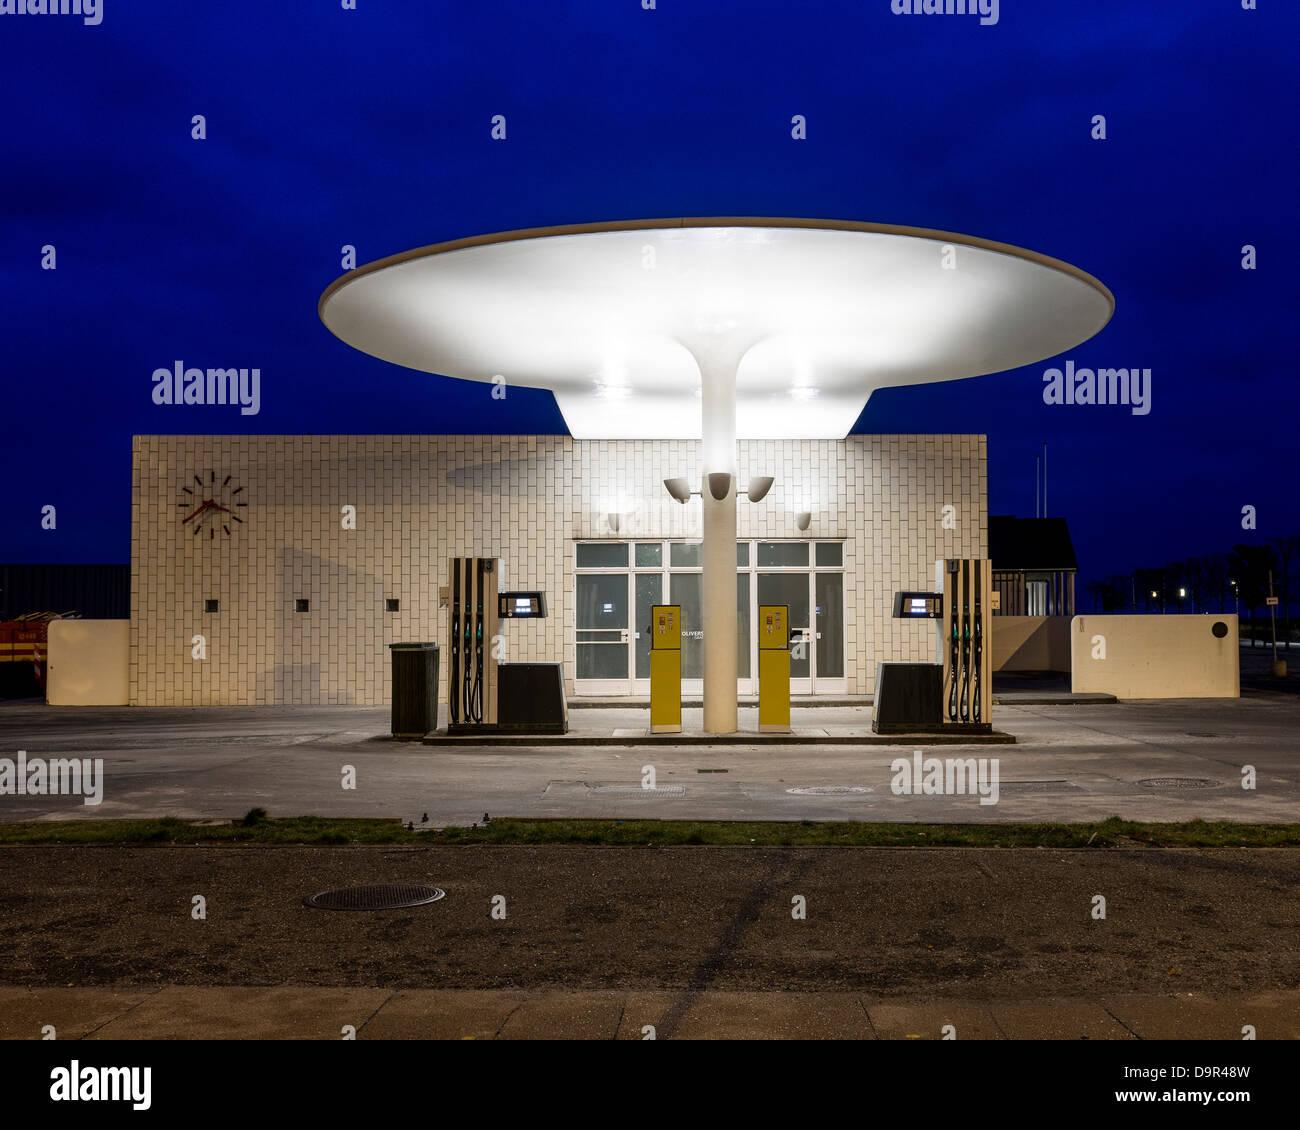 Skovshoved Petrol Station, Copenhagen, Denmark. Architect: Arne Jacobsen, 1936. Front elevation of petrol station Stock Photo